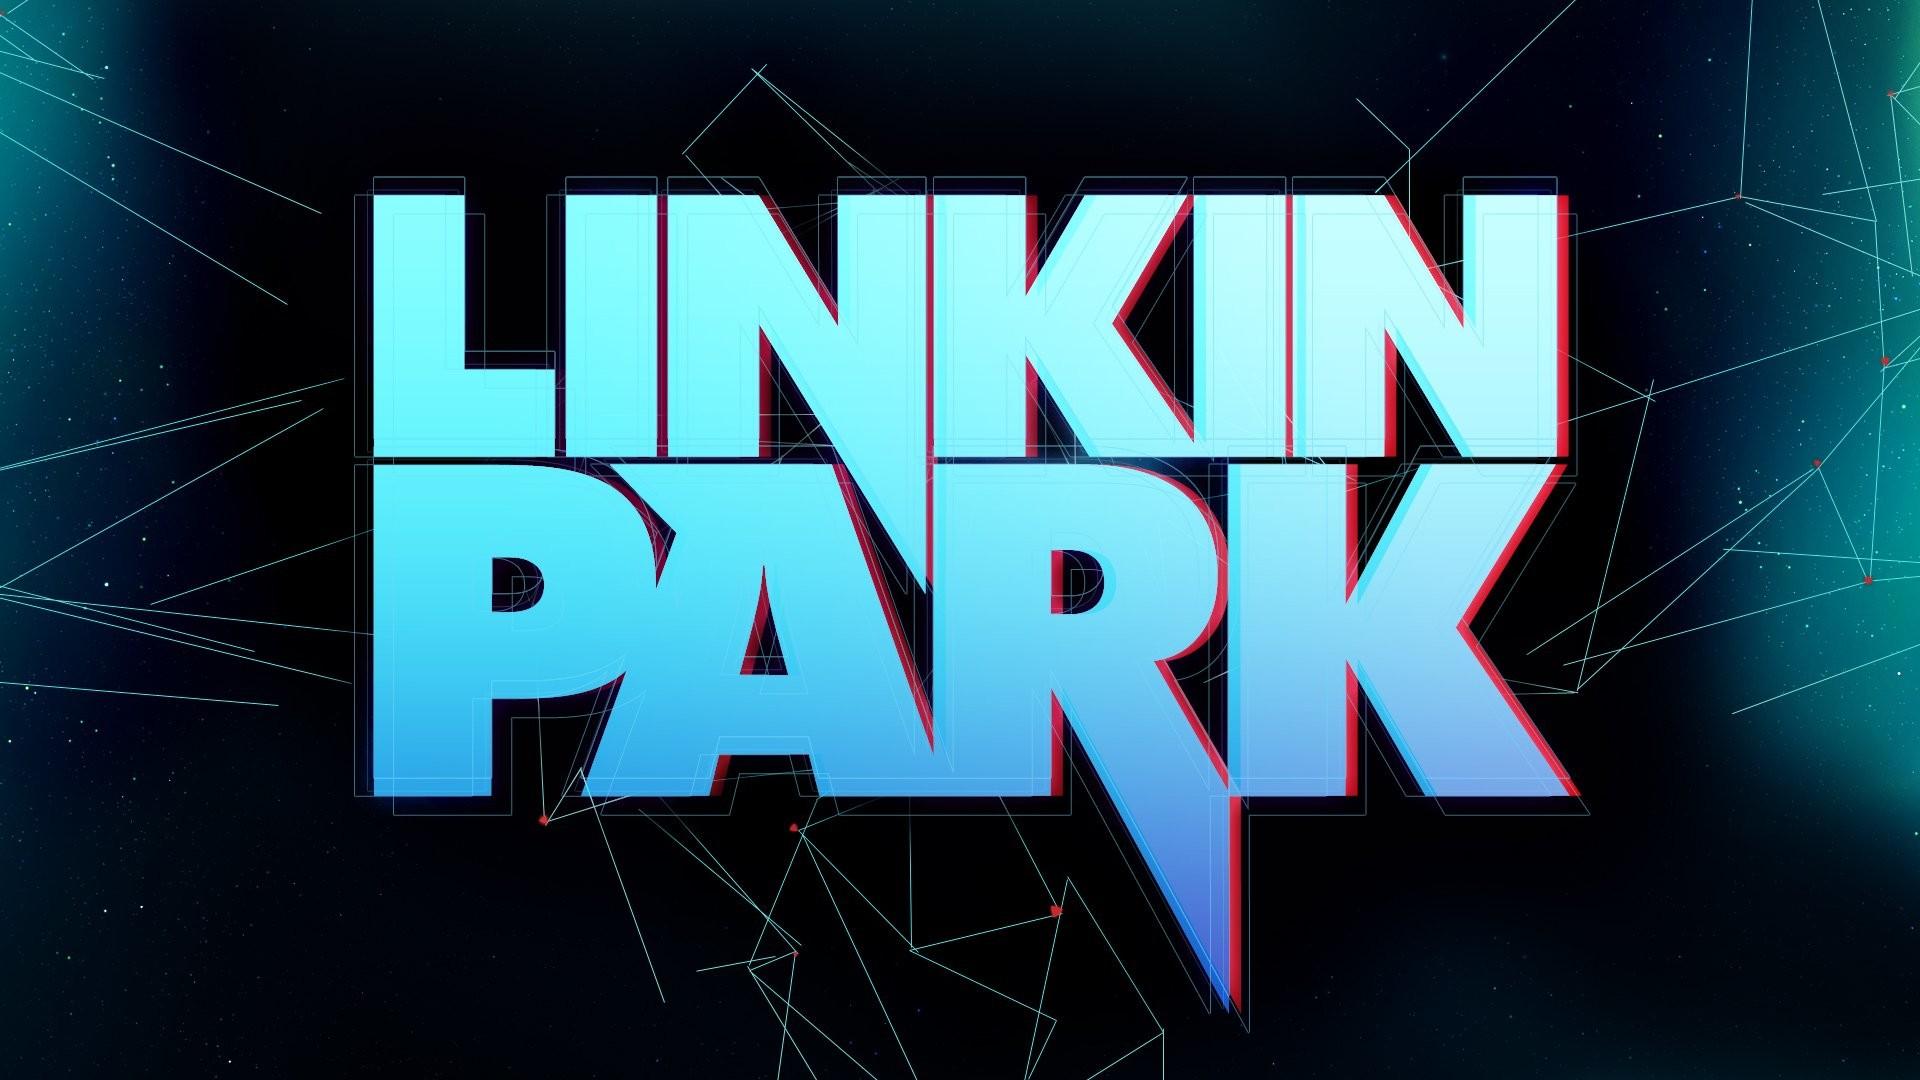 linkin park logo 2018